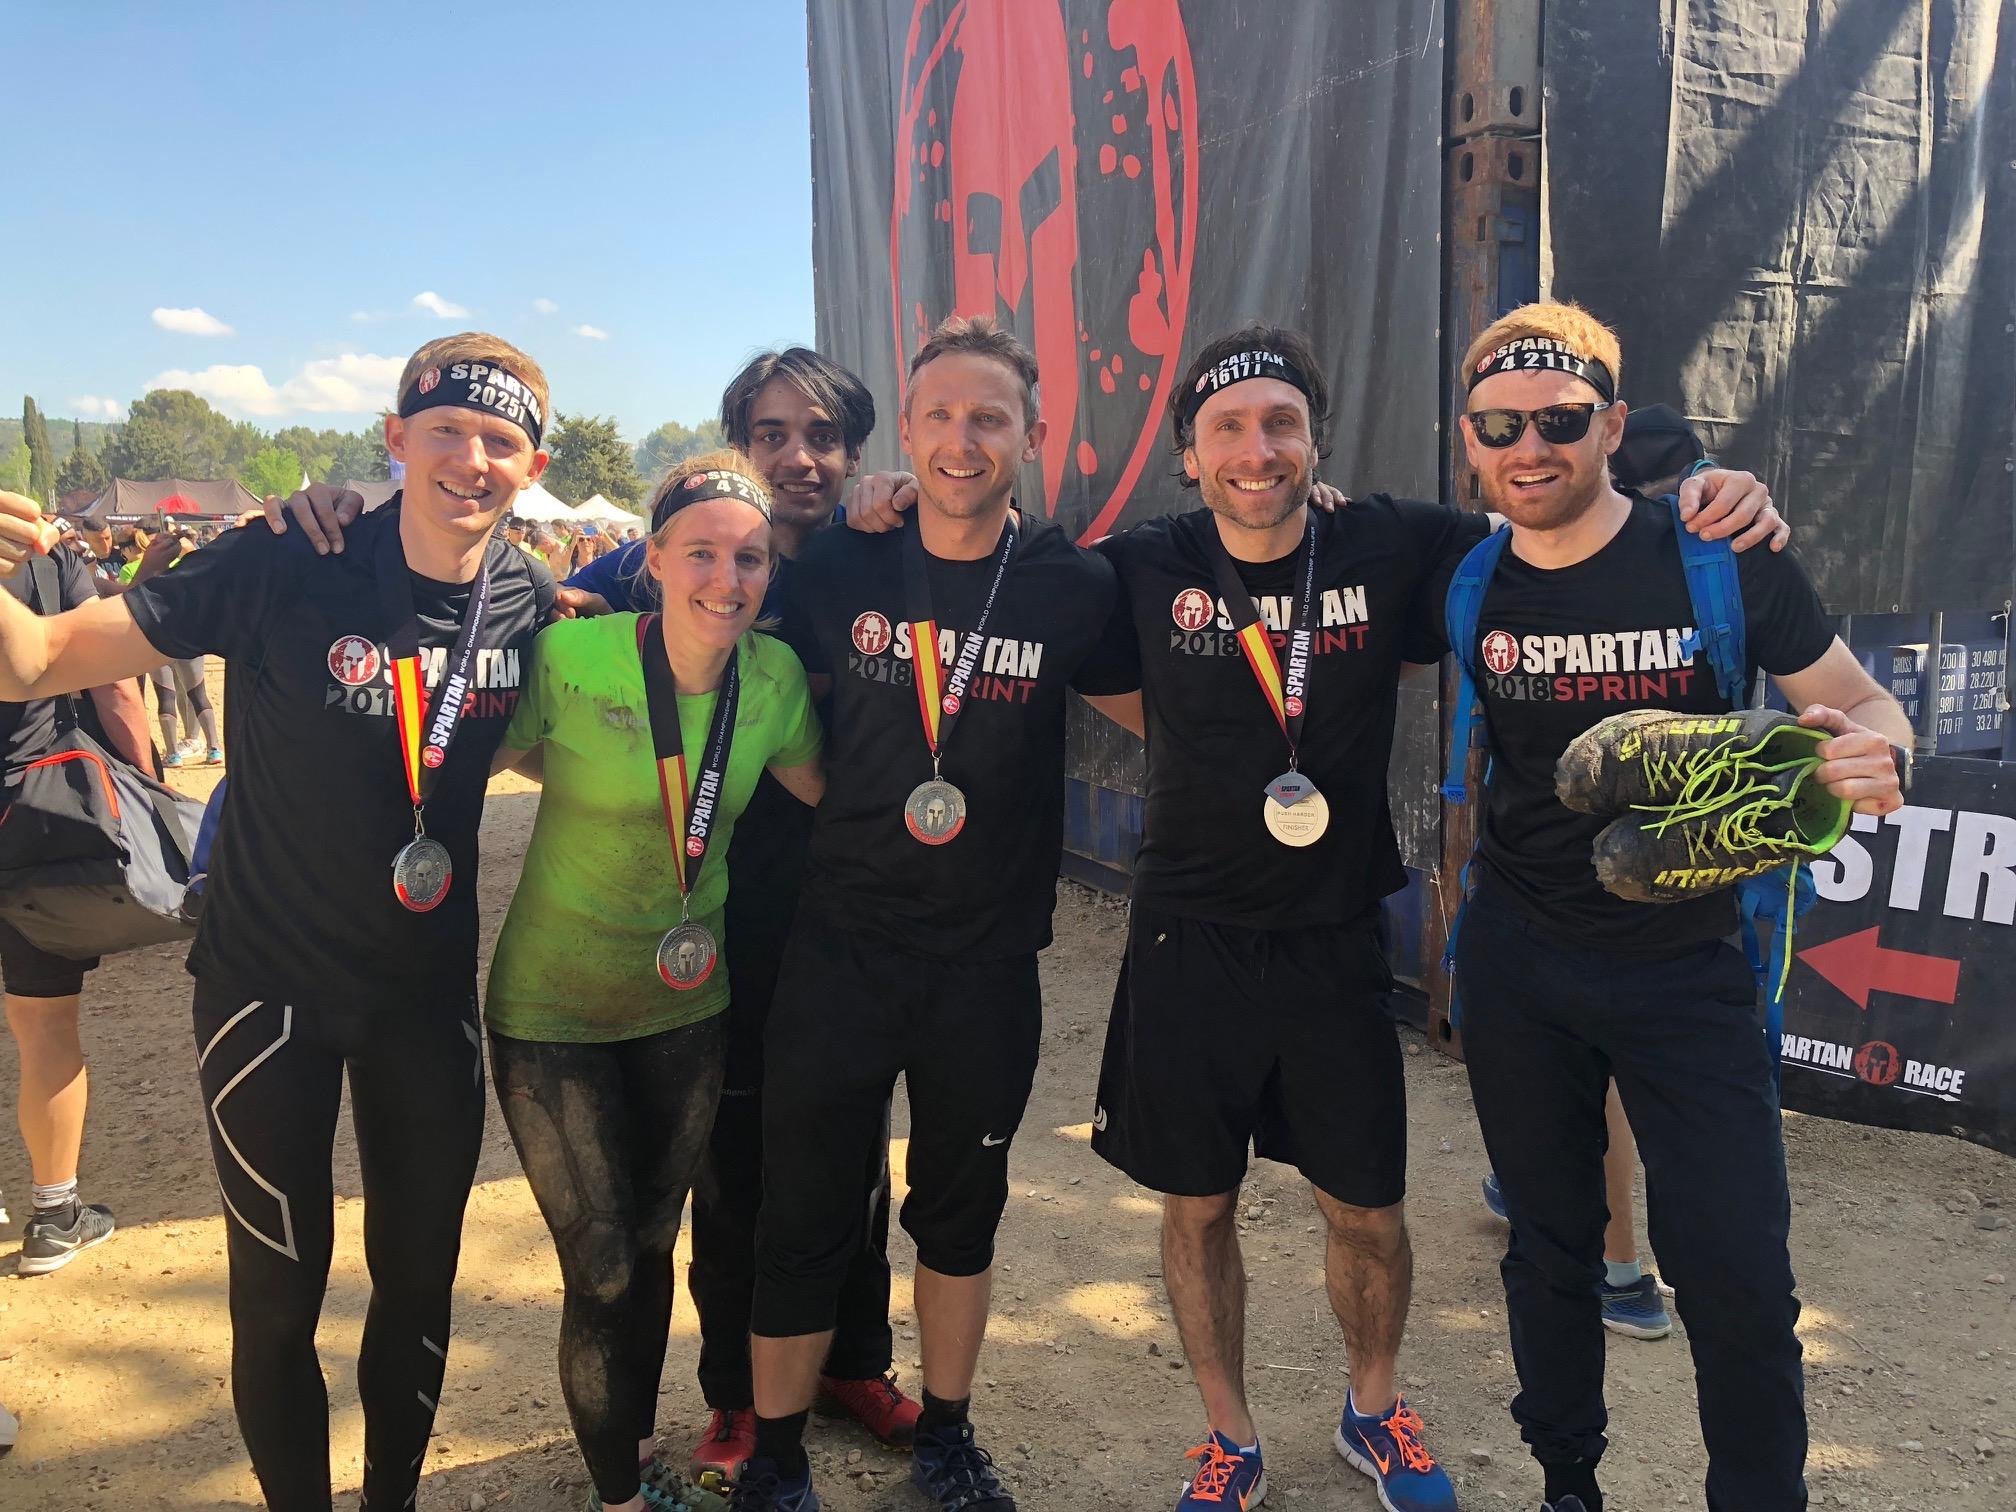 Teamet på Spartan Race